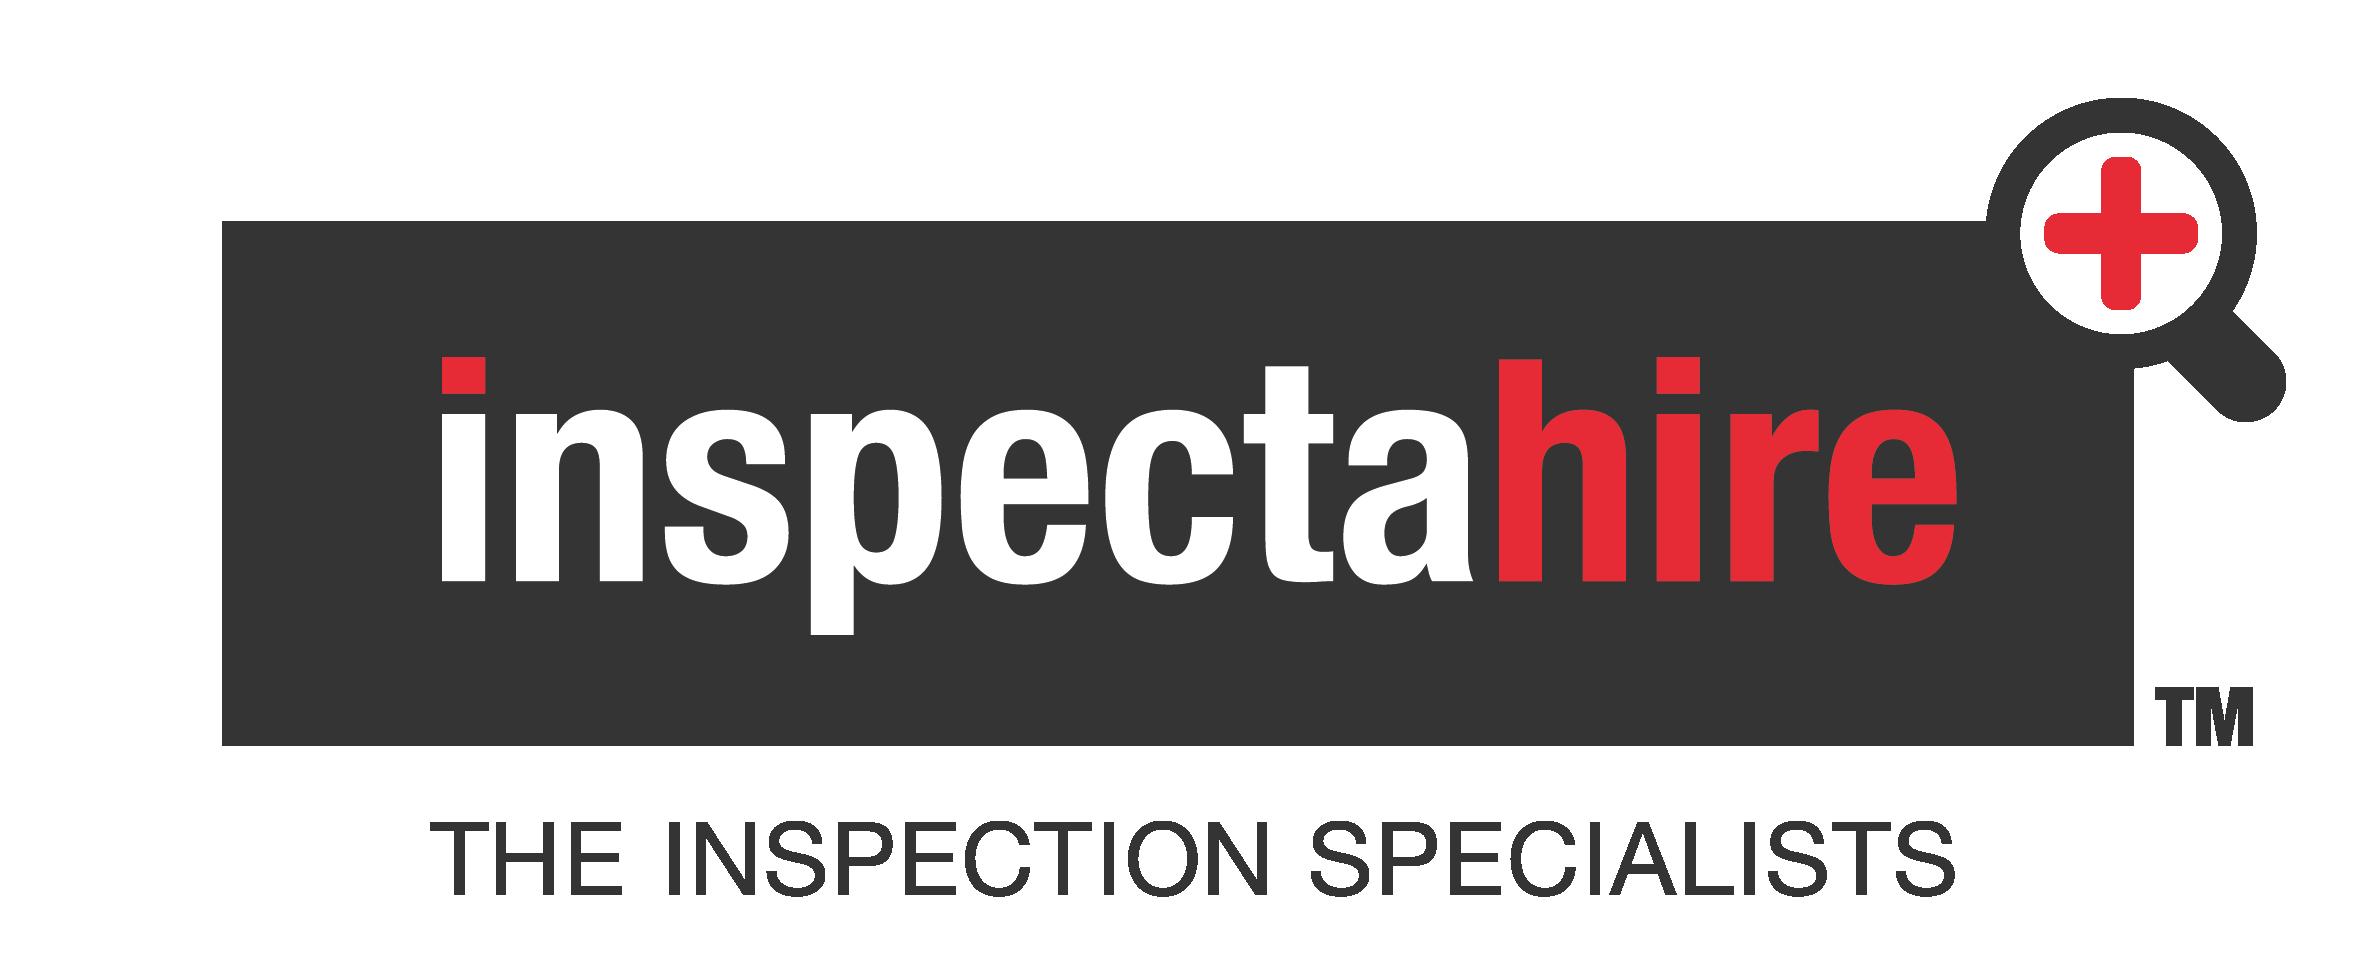 Inspectahire Instrument Company Ltd